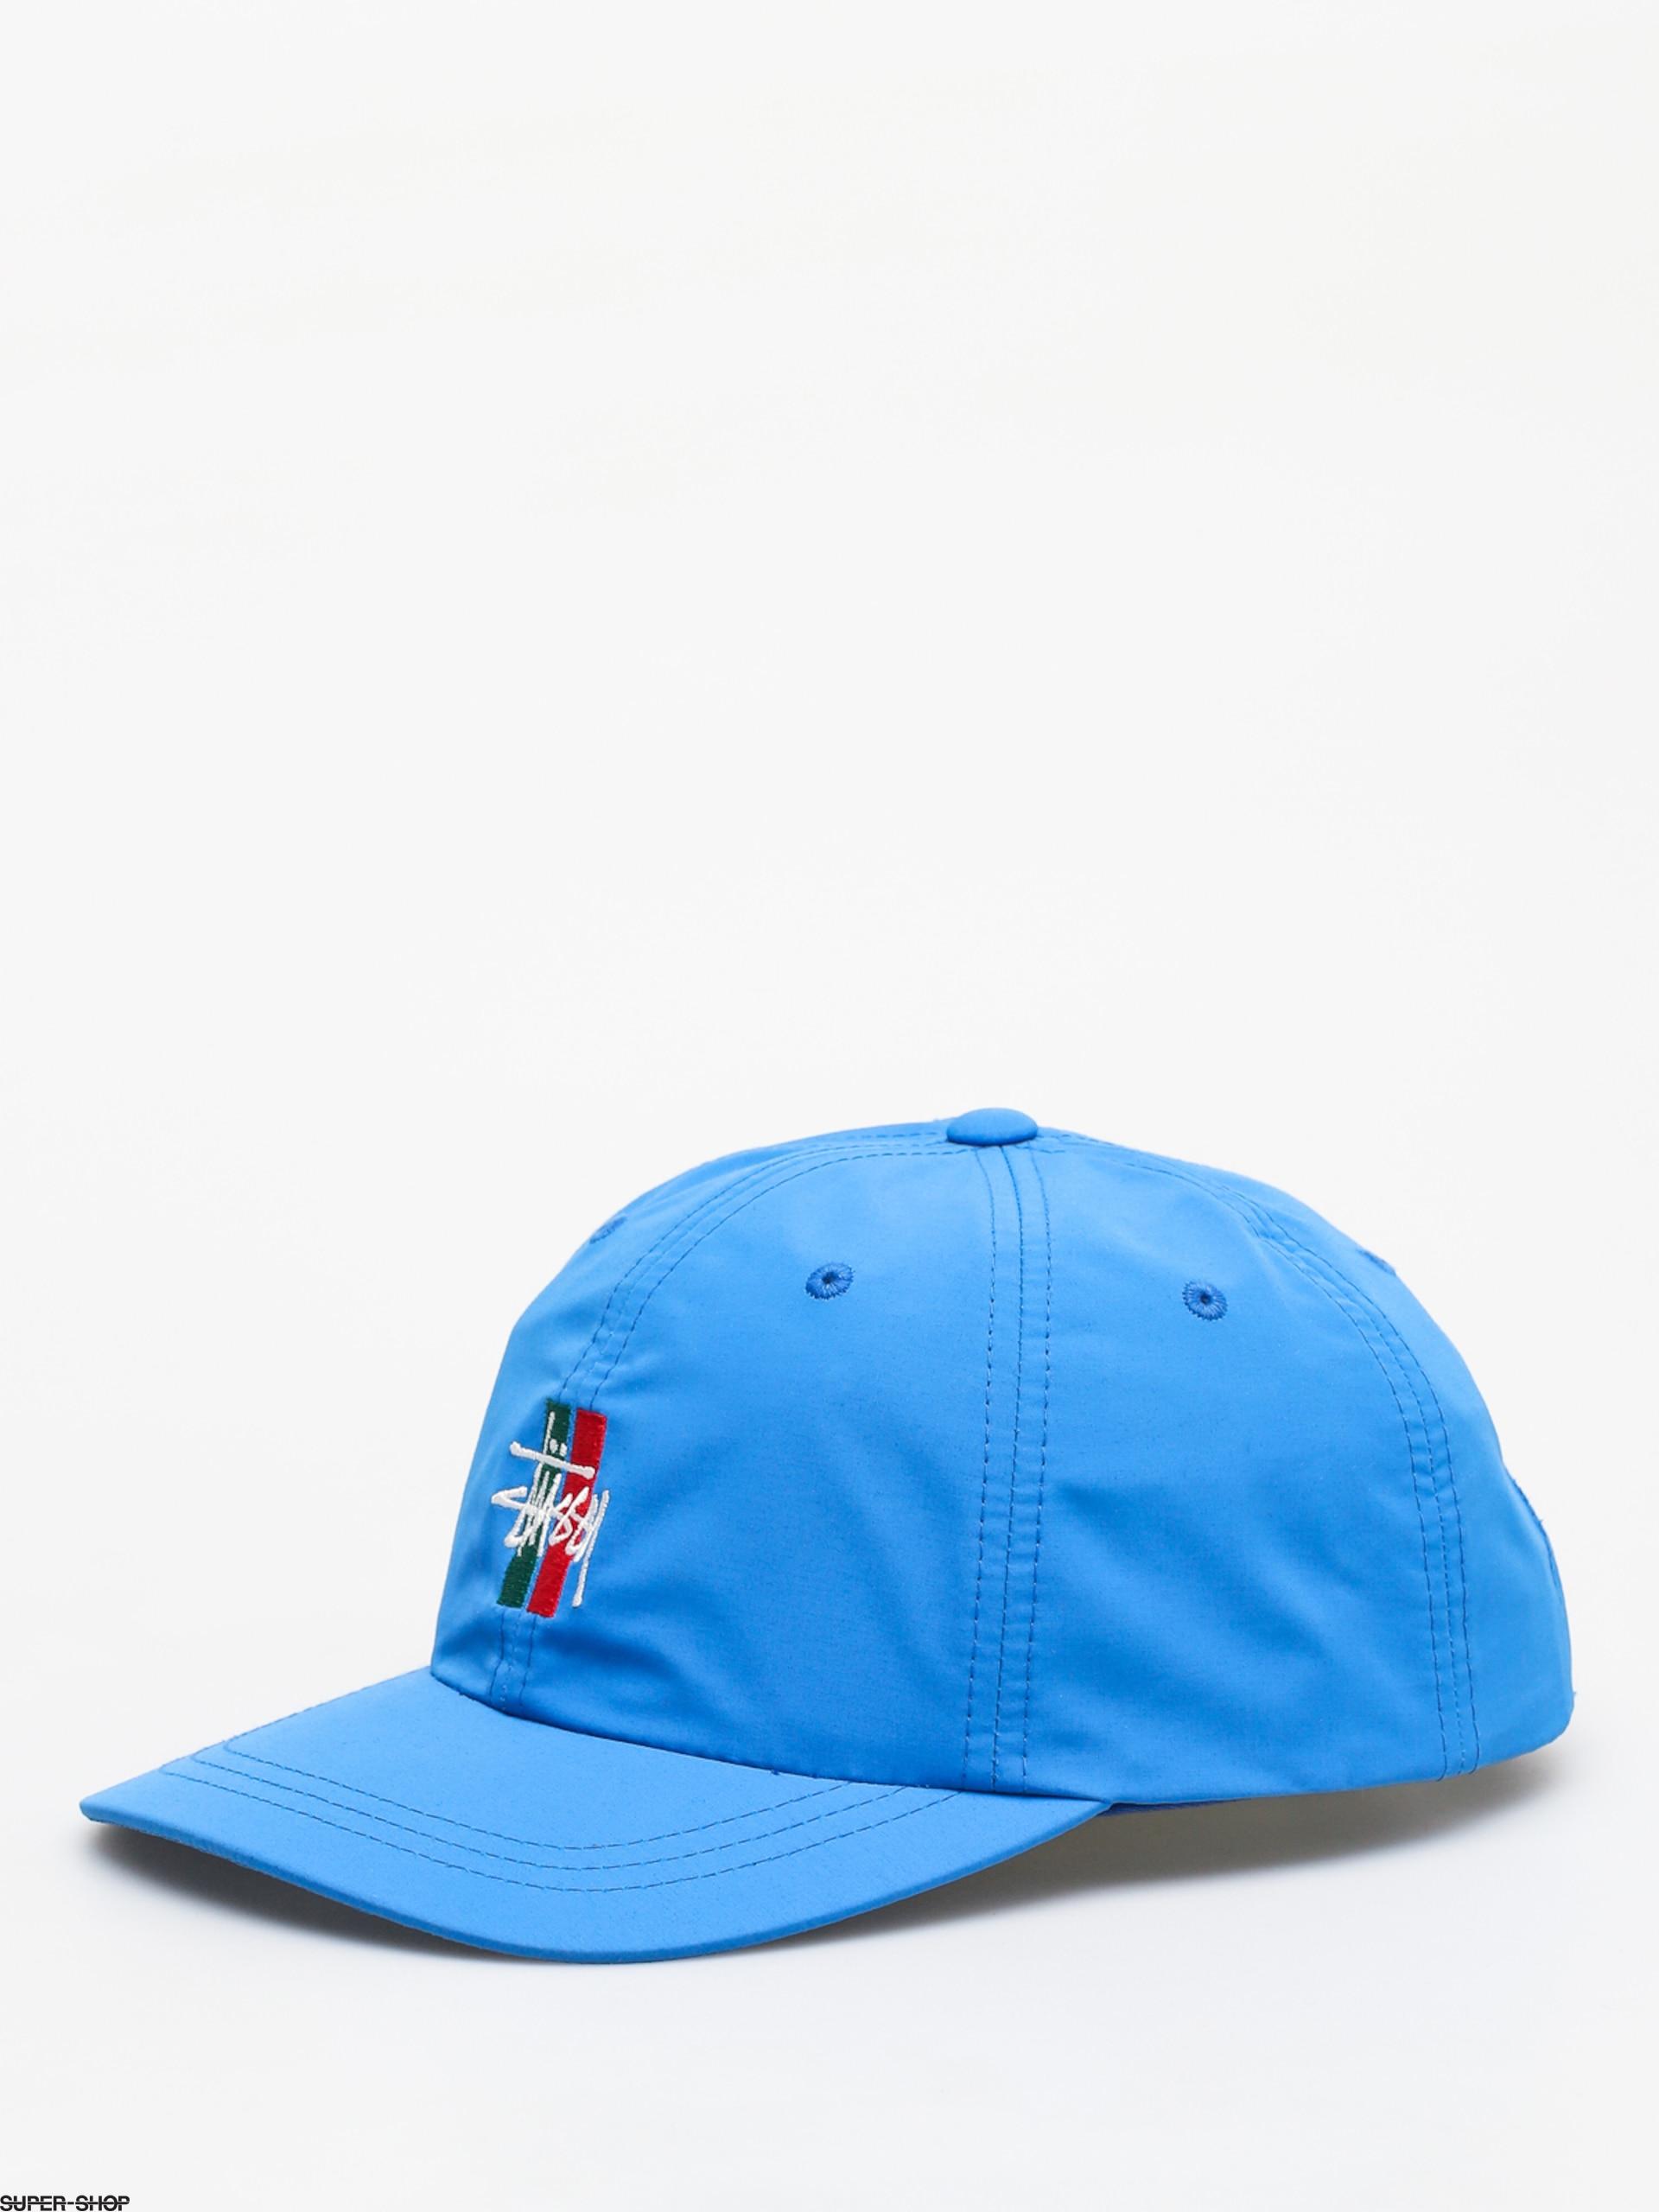 8dc367f4c77 1021154-w1920-stussy-bars-logo-low-pro-cap-blue.jpg